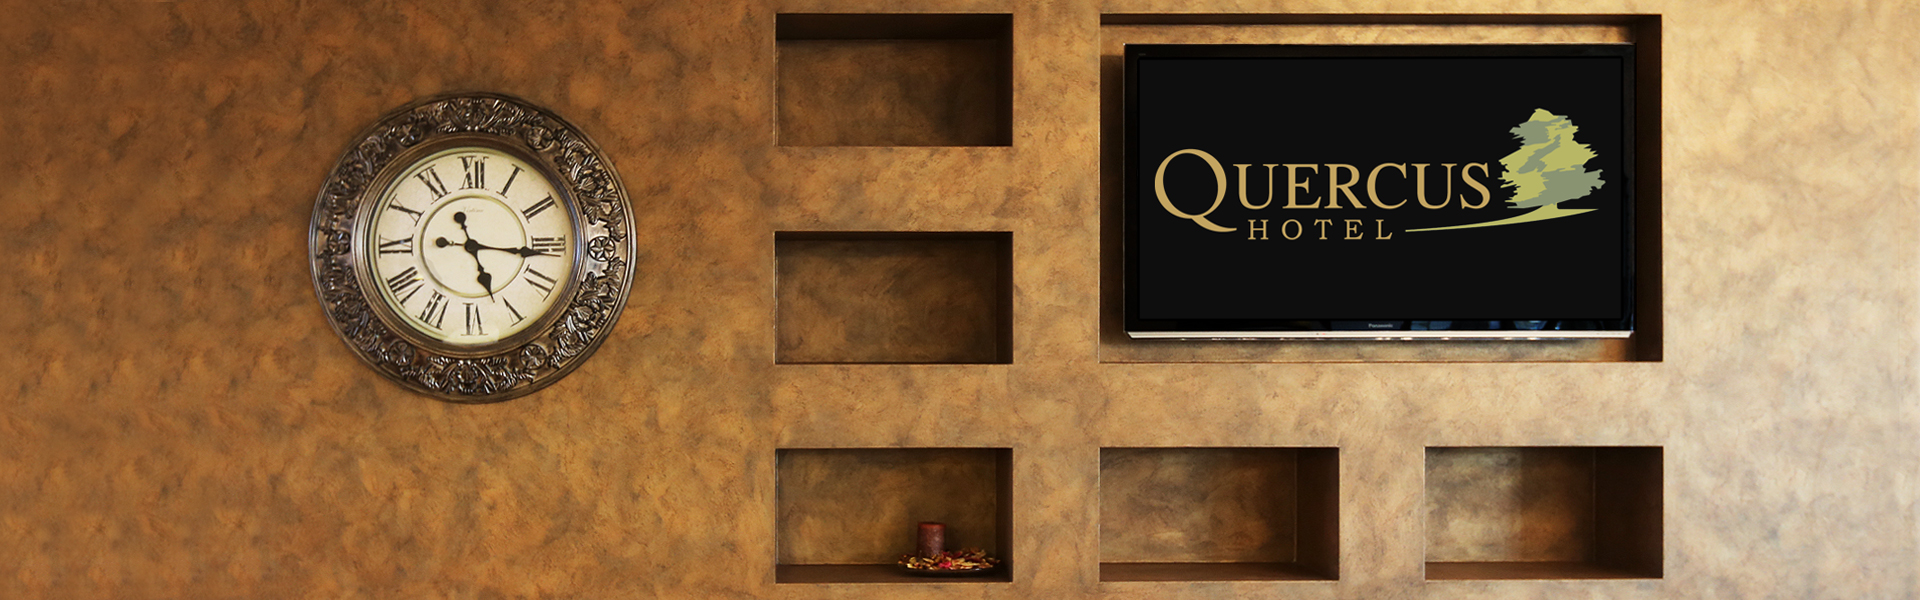 Hotel Quercus Lobby